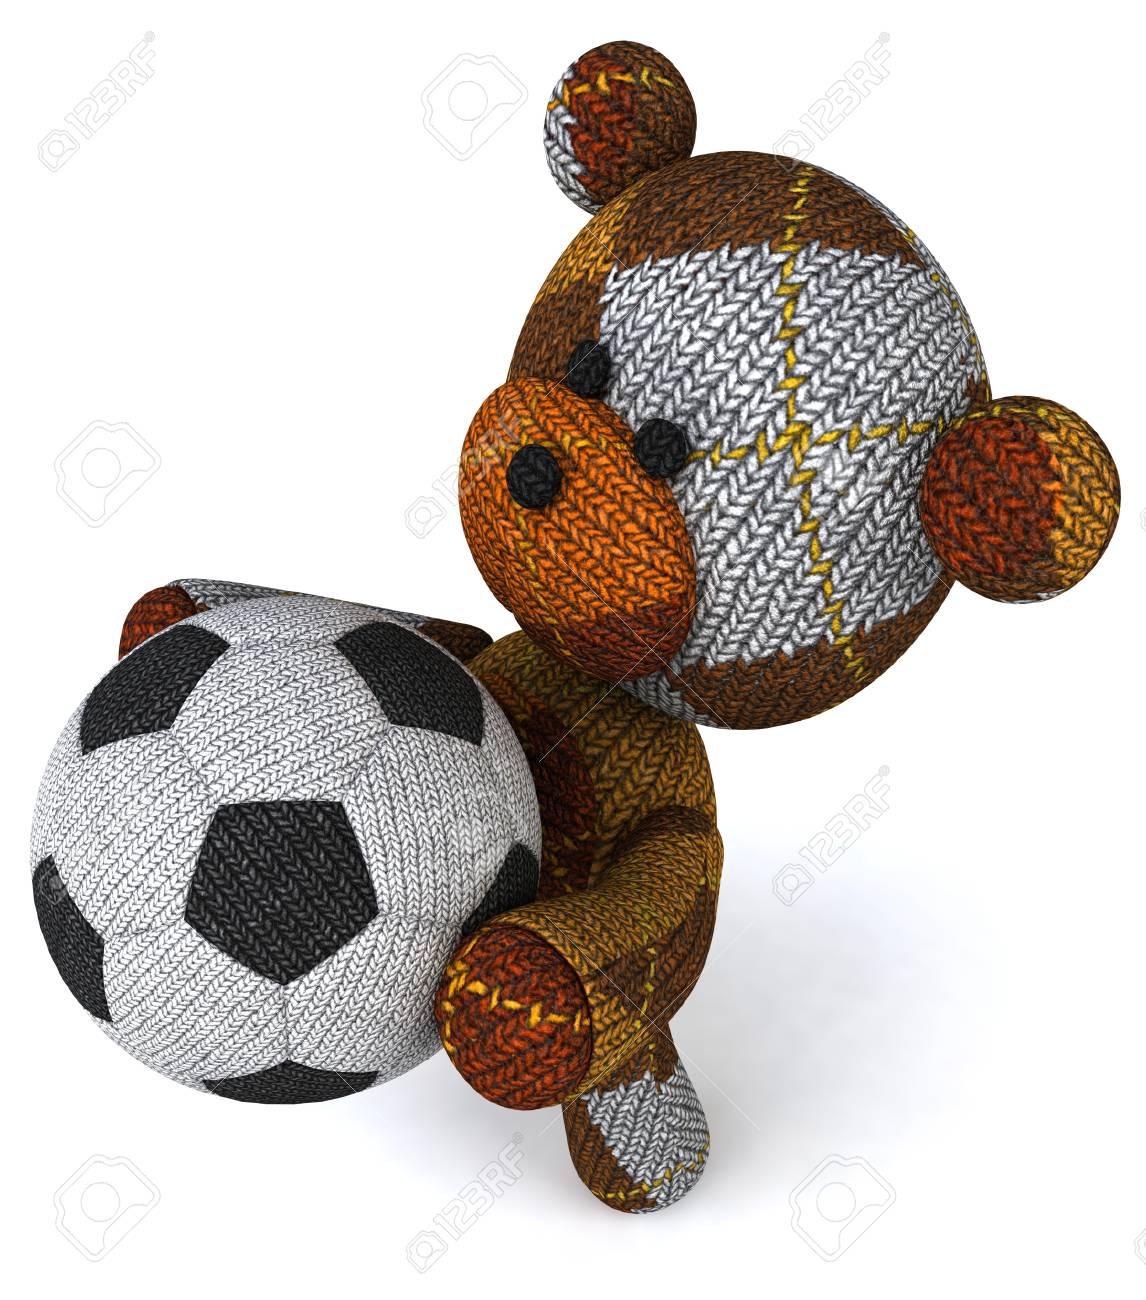 87205b74f6e Cartoon knitted teddy bear with soccer ball Stock Photo - 83466373